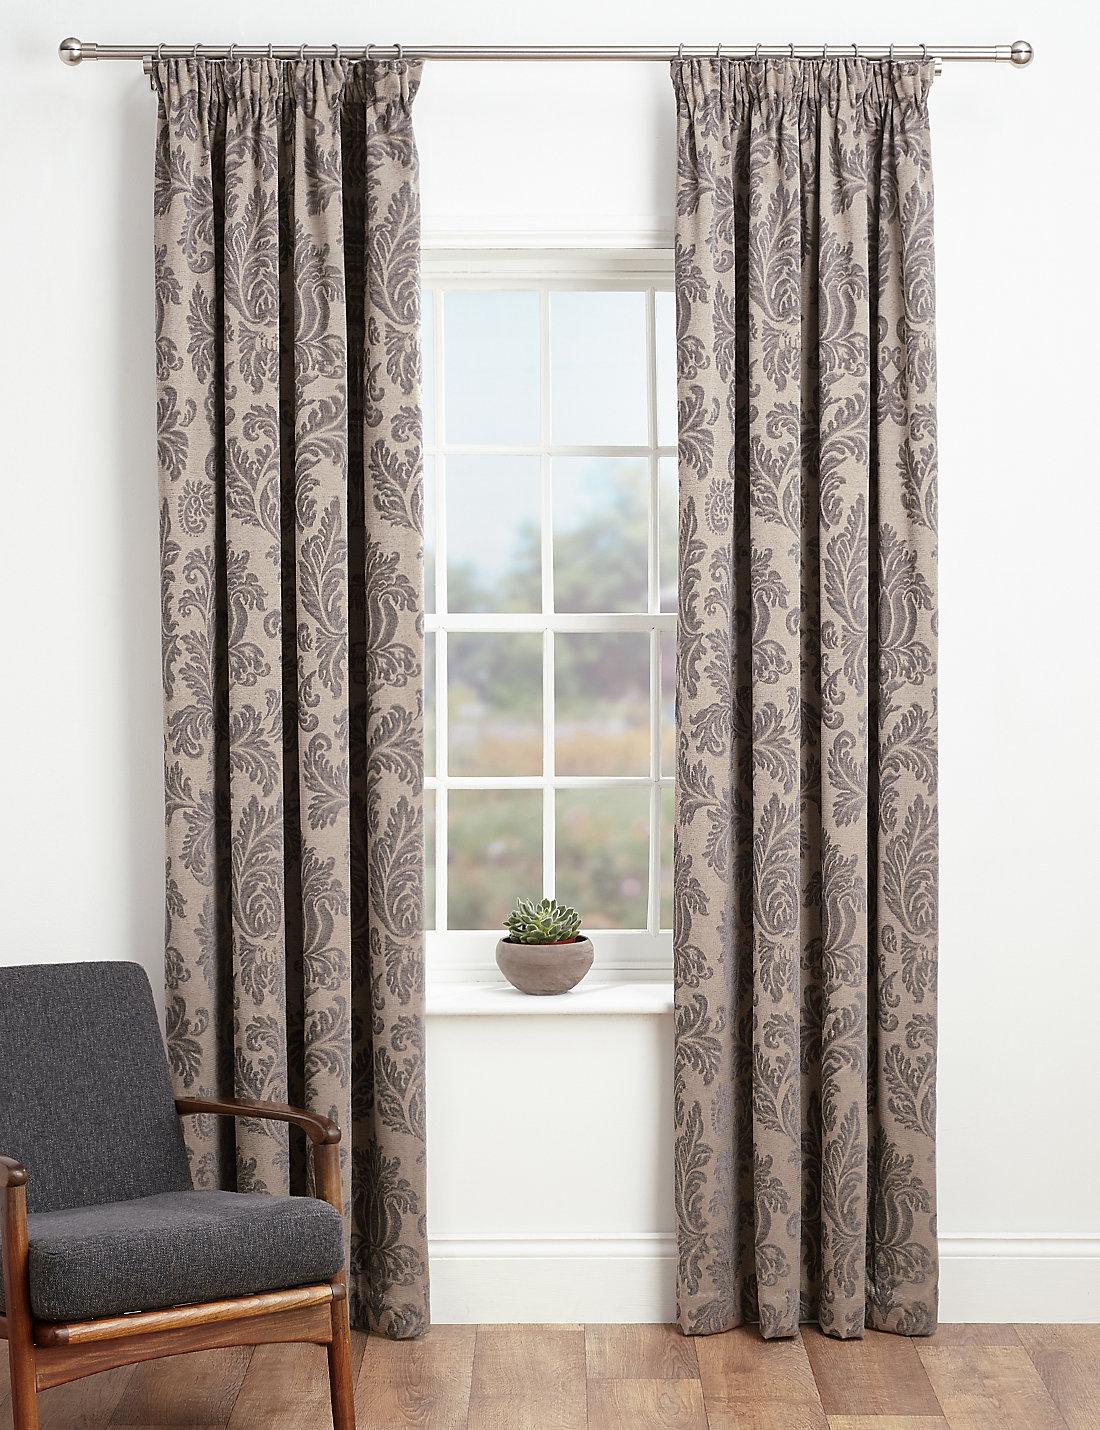 Damask bedroom curtains - Elegant Damask Pencil Pleat Curtains